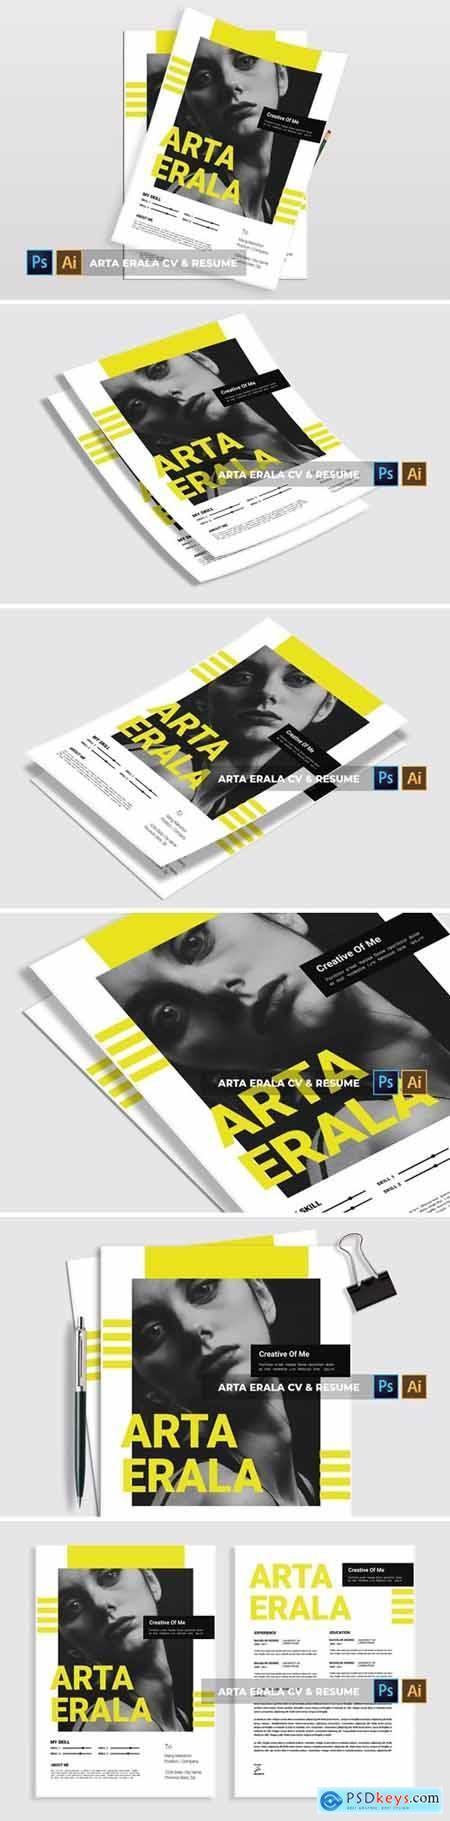 Arta Erala - CV & Resume